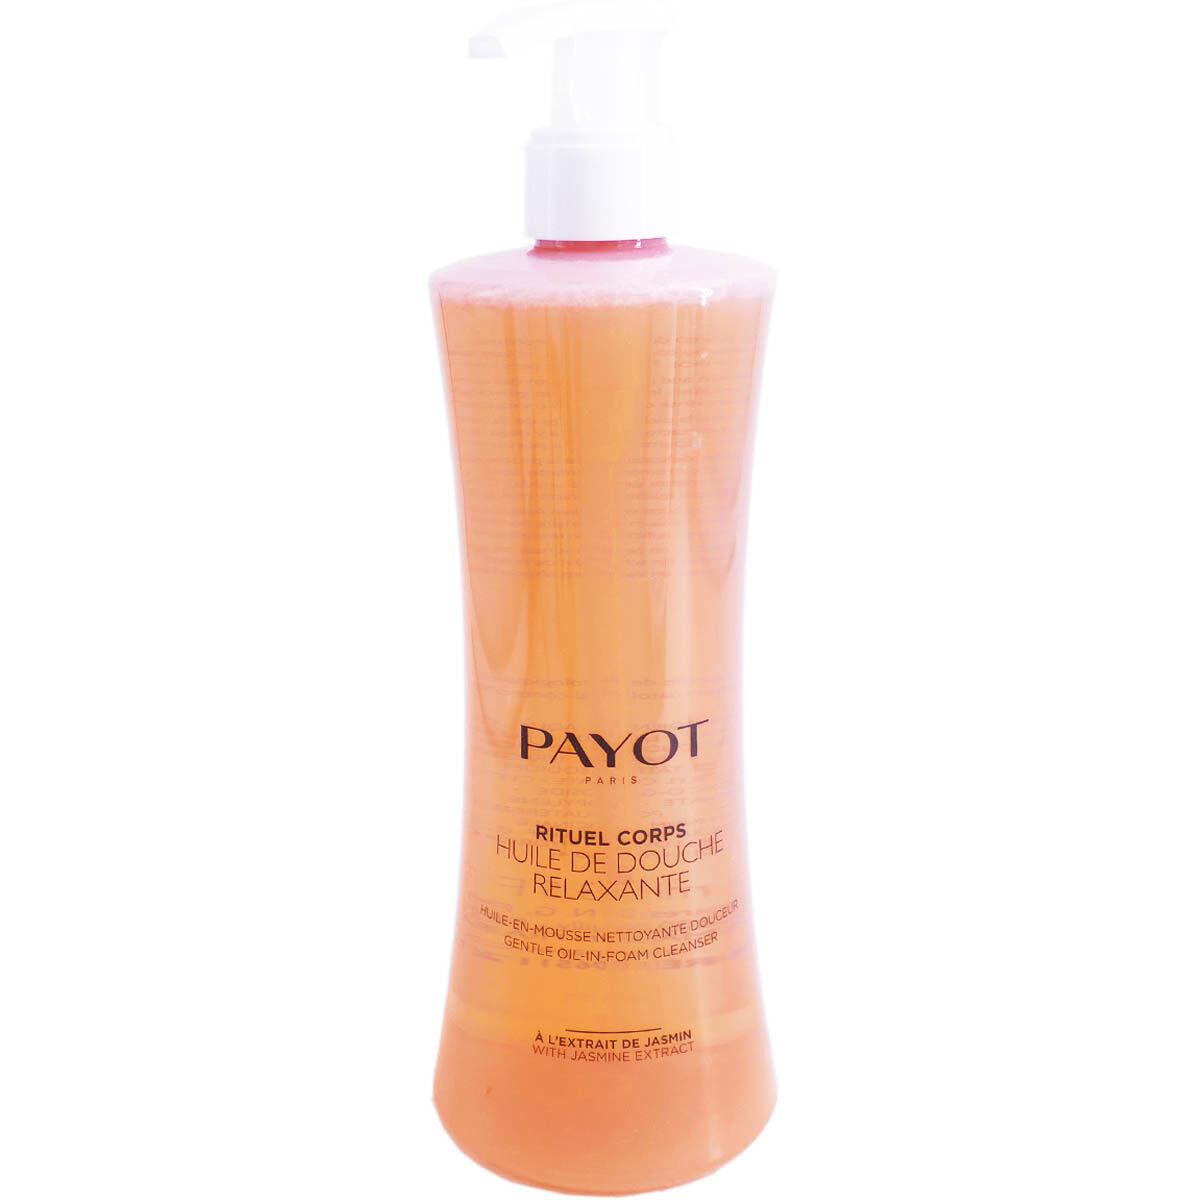 Payot rituel corps huile de douche relaxante 400ml